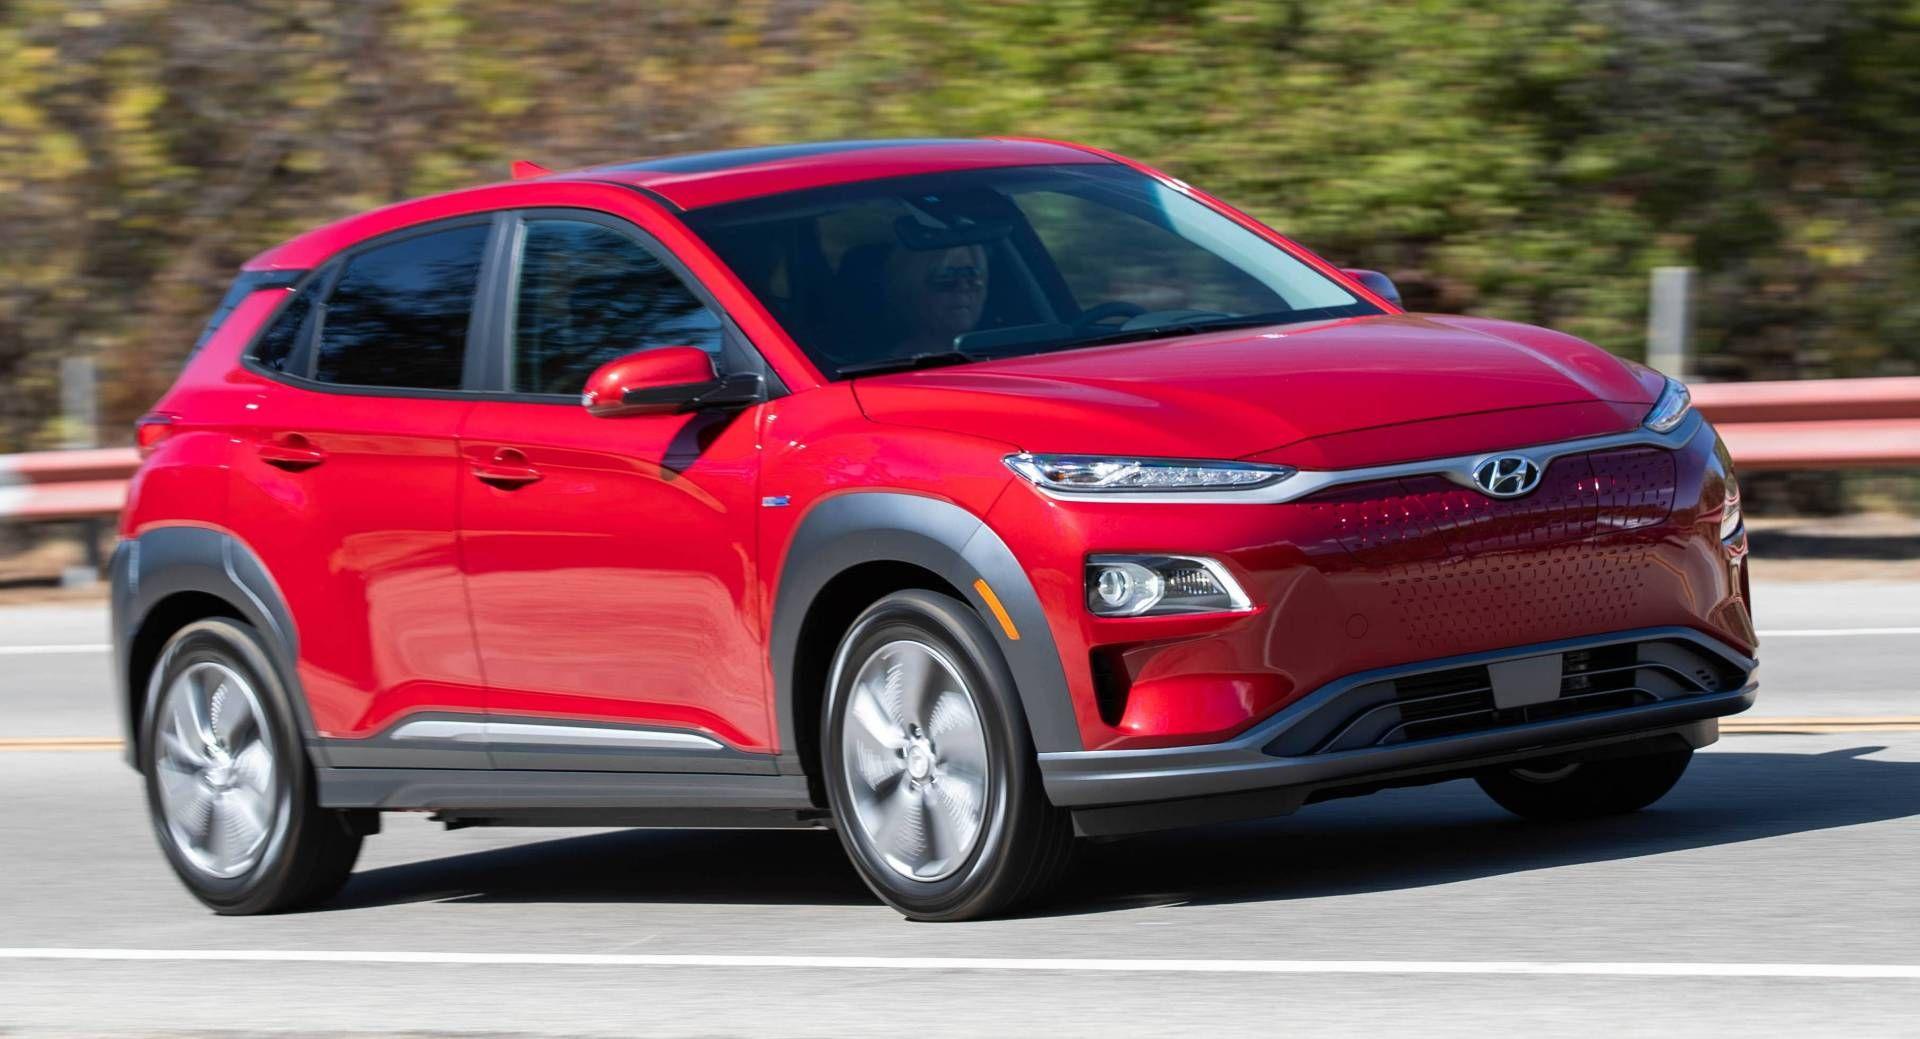 2020 Hyundai Kona Electric Gains 10 25 Inch Touchscreen Battery Warmer System Hyundai Electric Car Hyundai First Drive